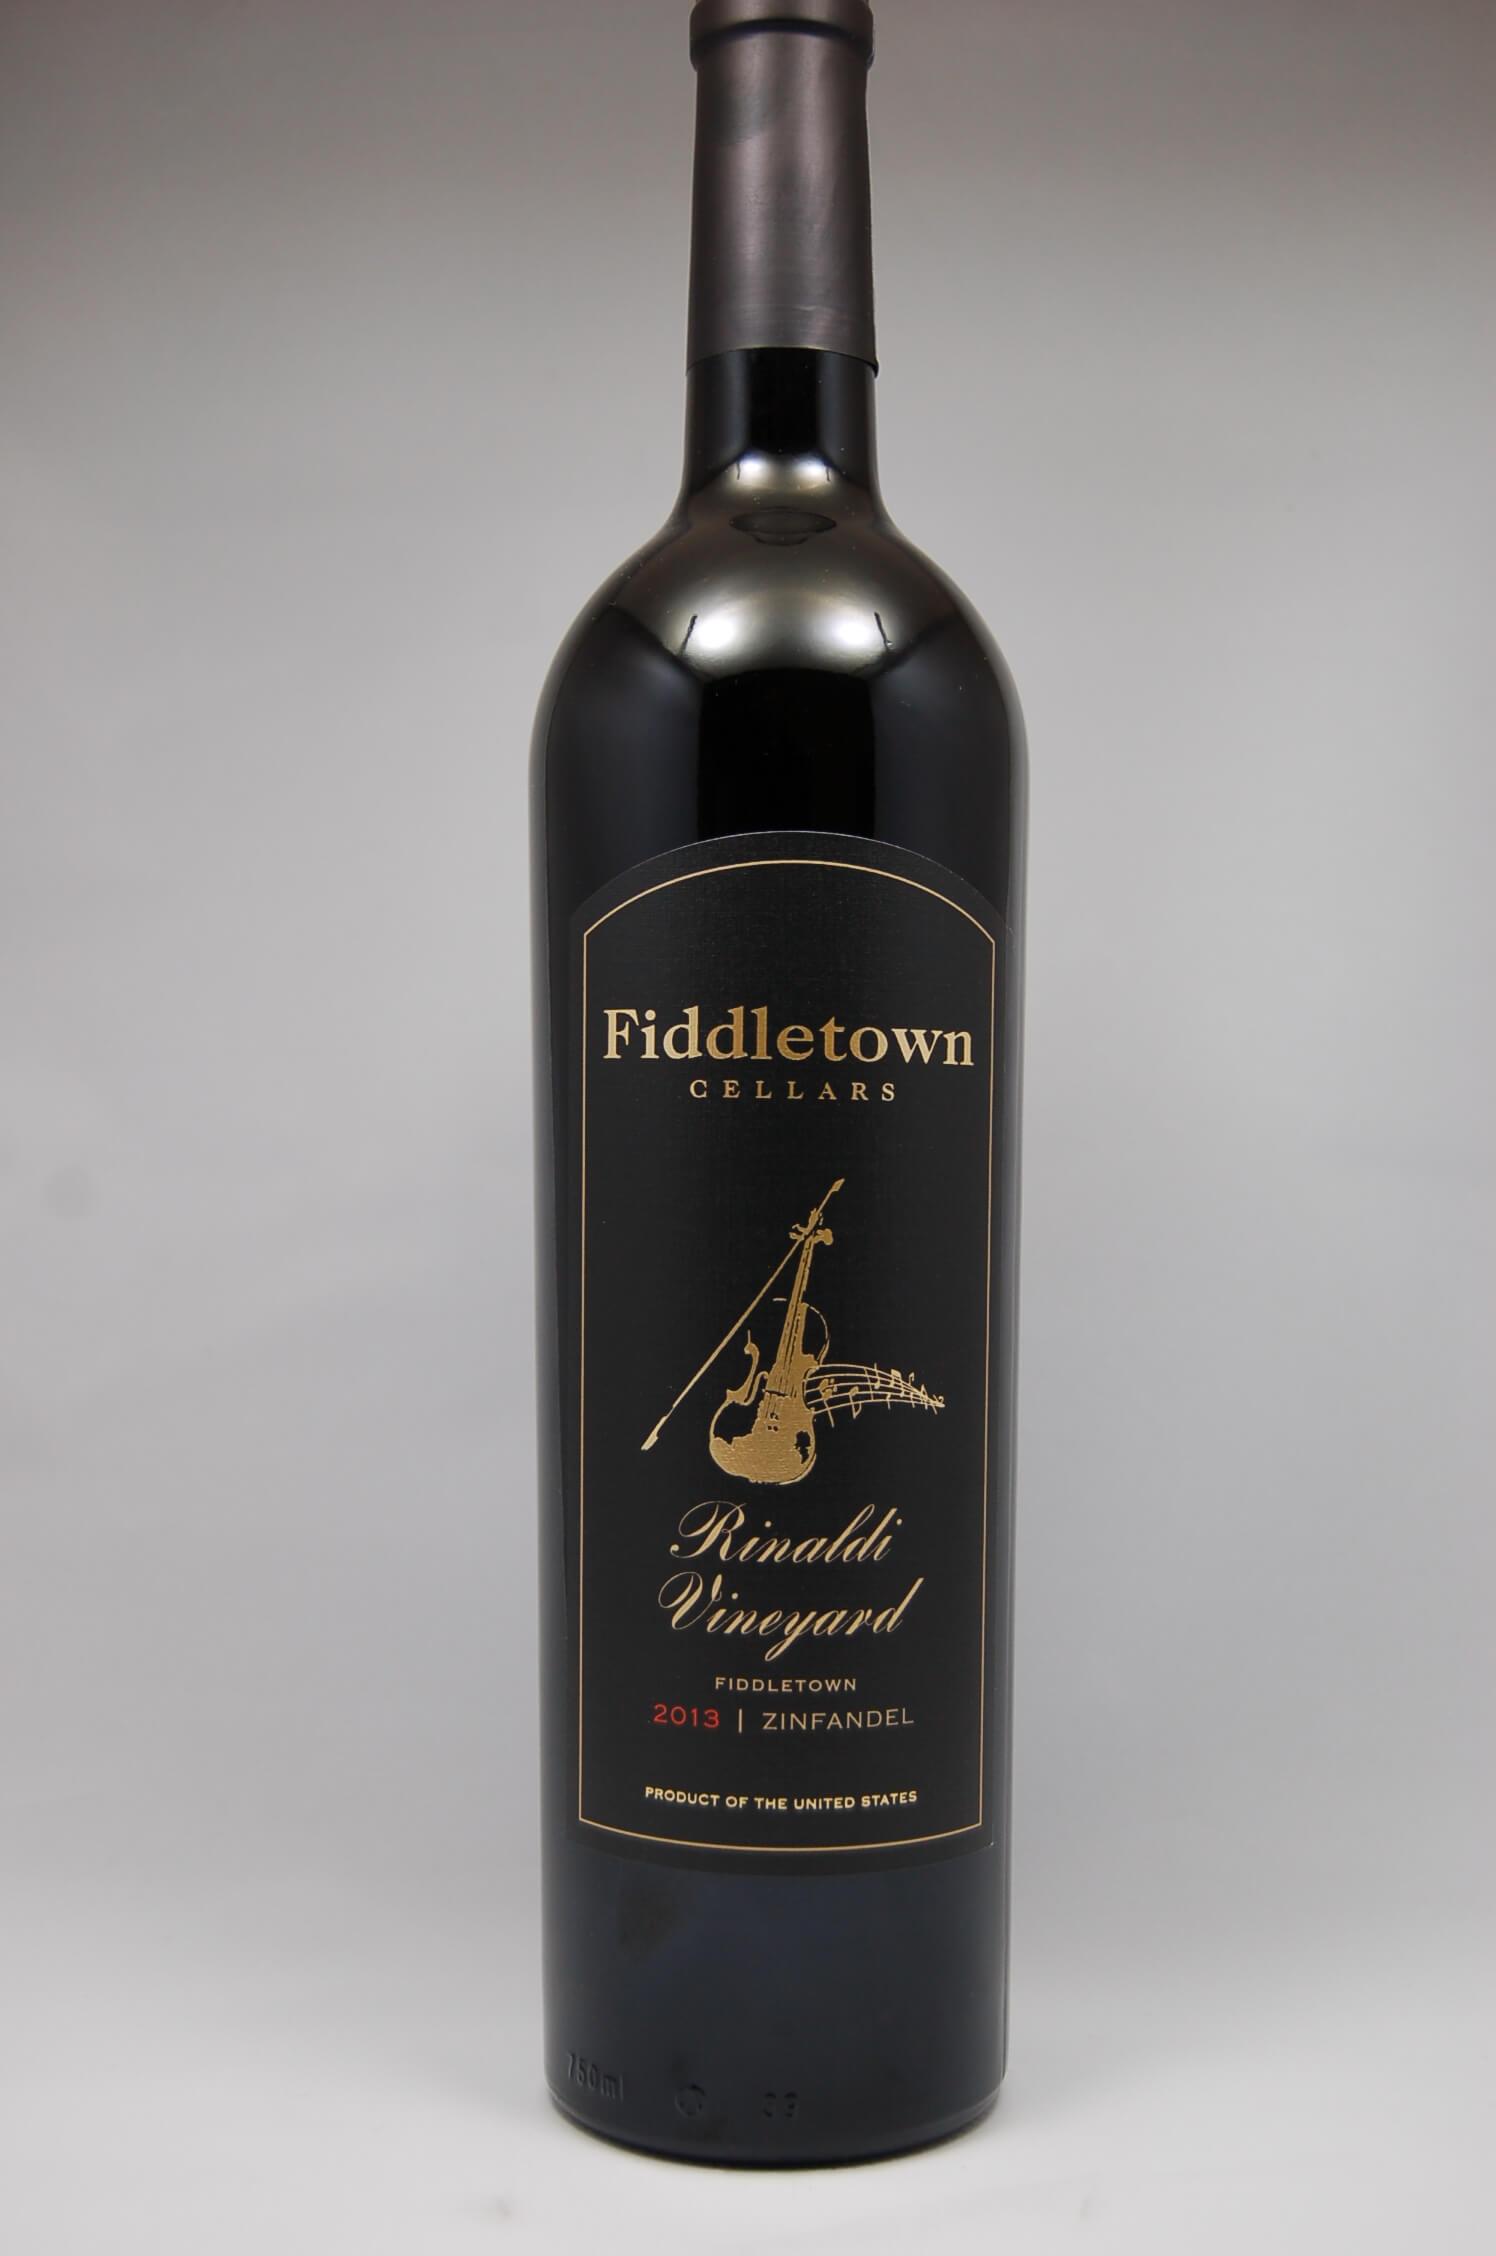 Fiddletown Cellars 2013 Zinfandel Rinaldi Vineyard